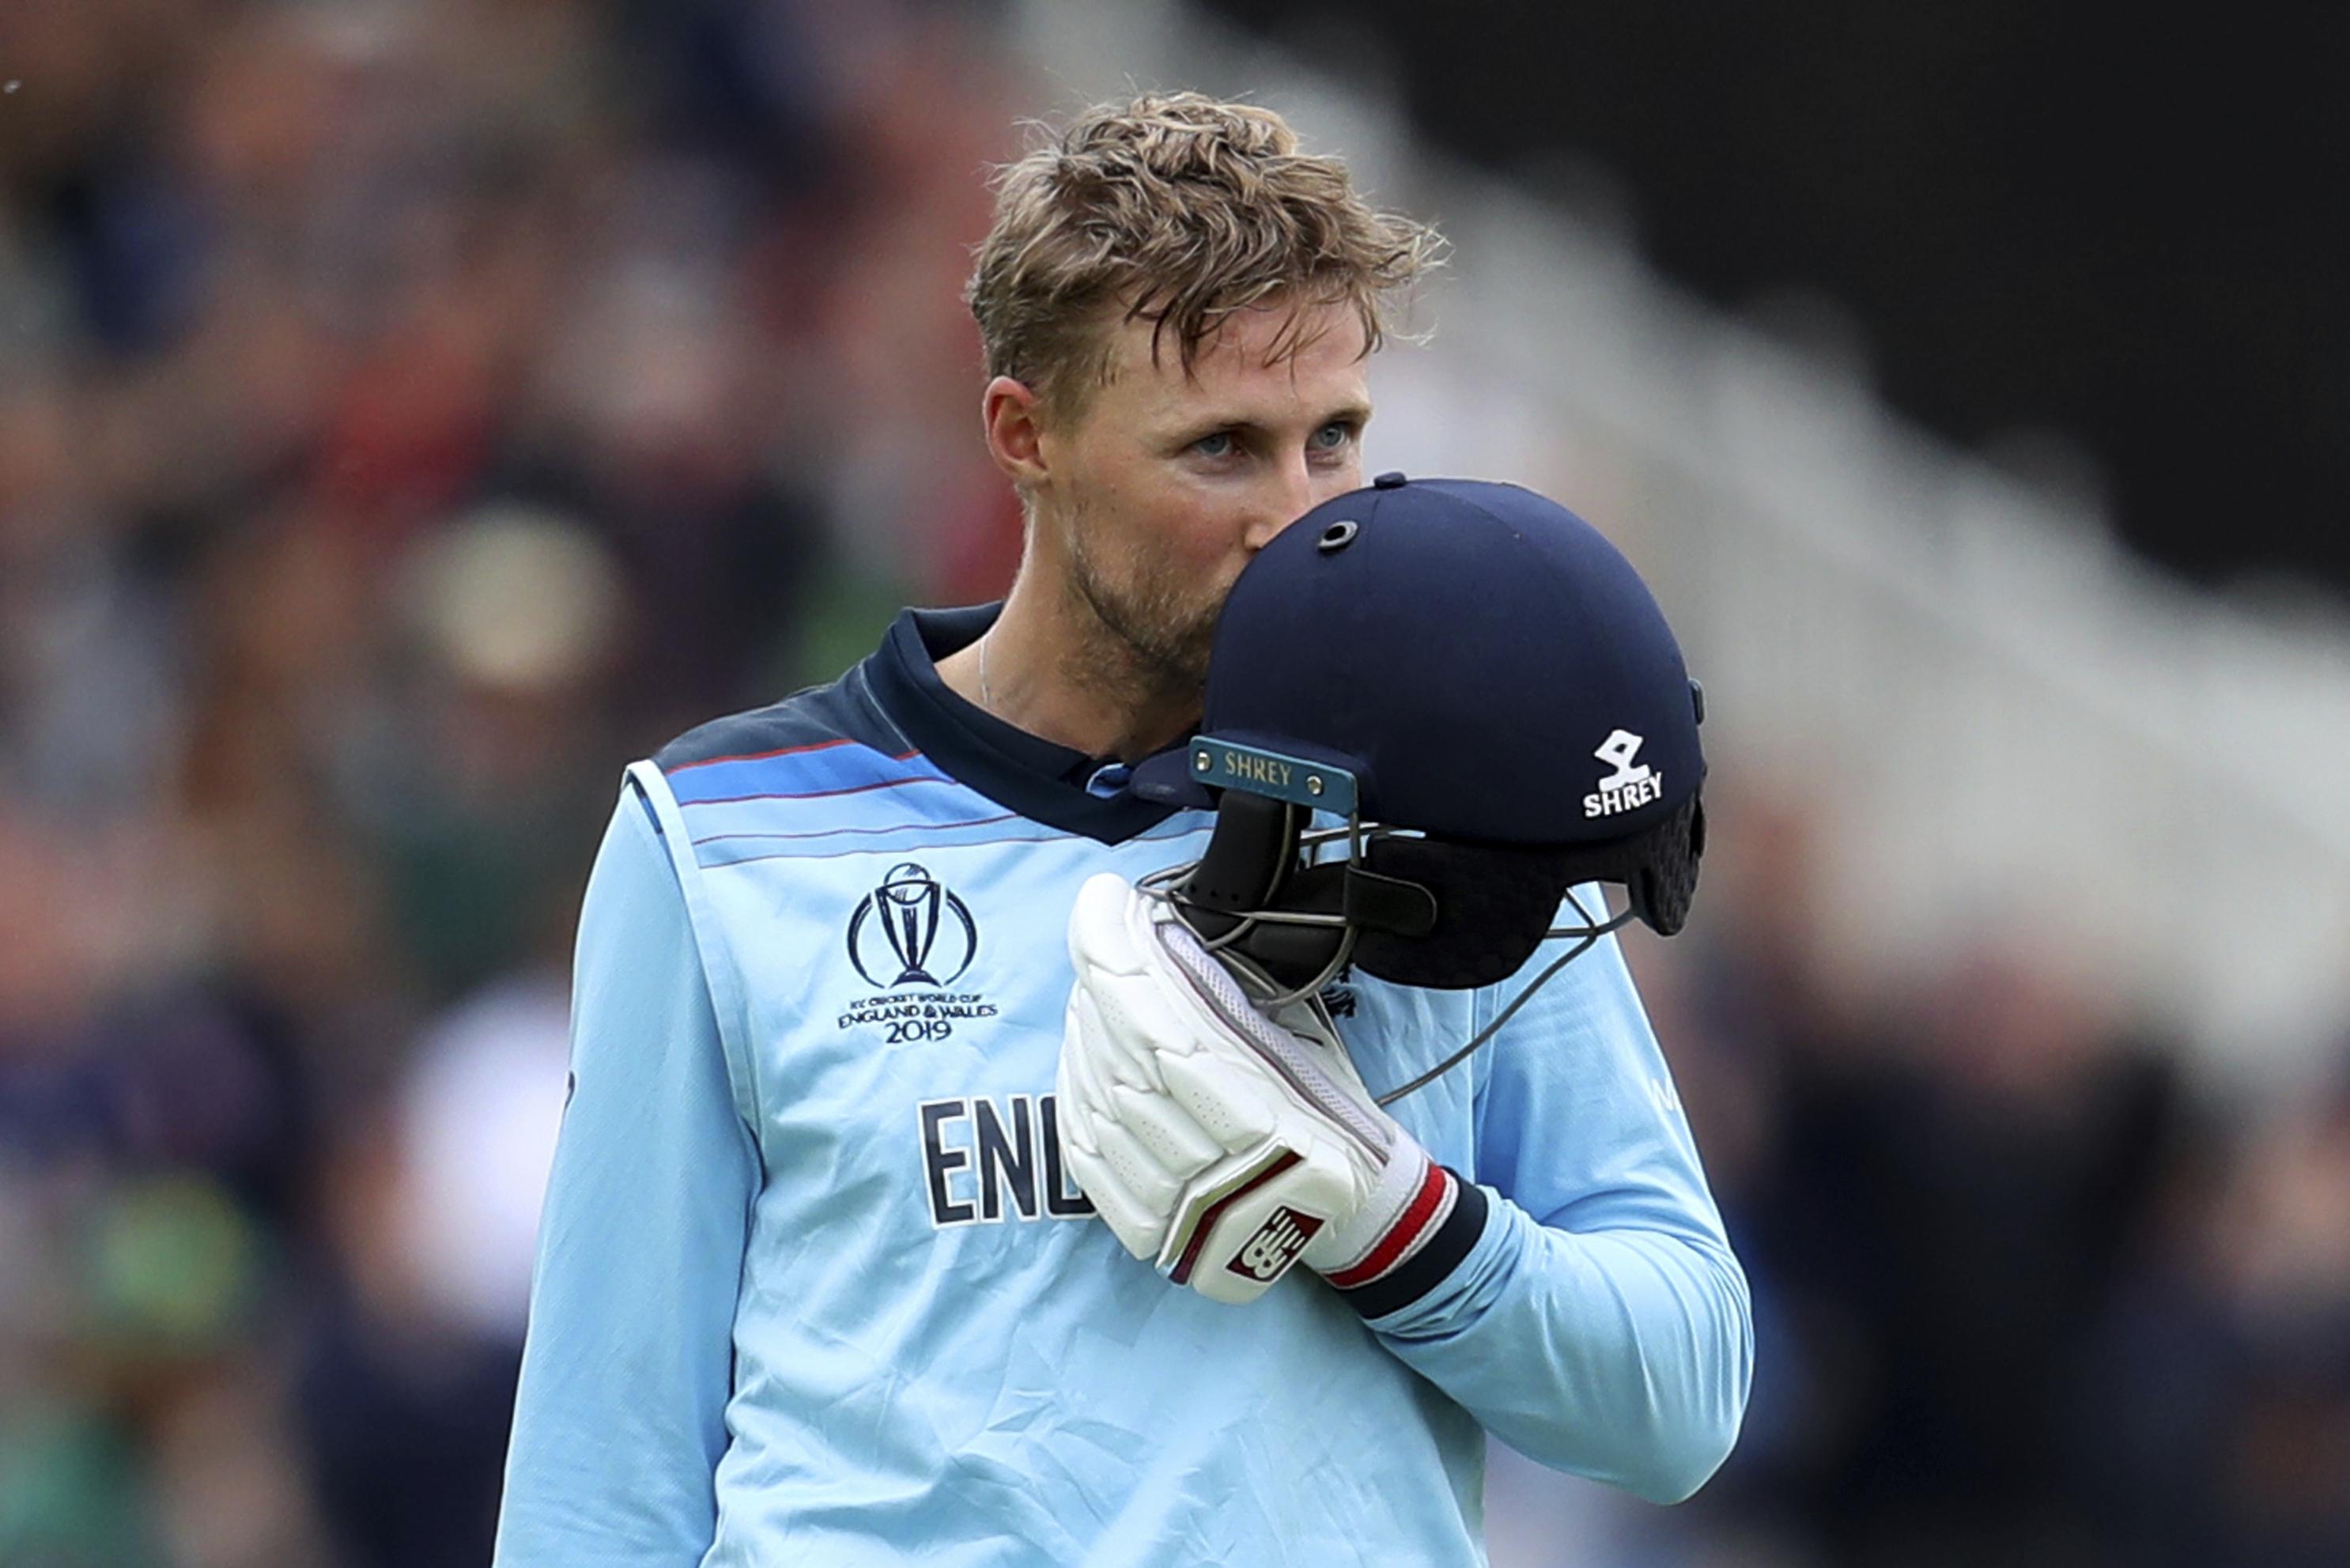 England's Joe Root kisses his helmet after scoring a century against Pakistan at Trent Bridge on June 3.